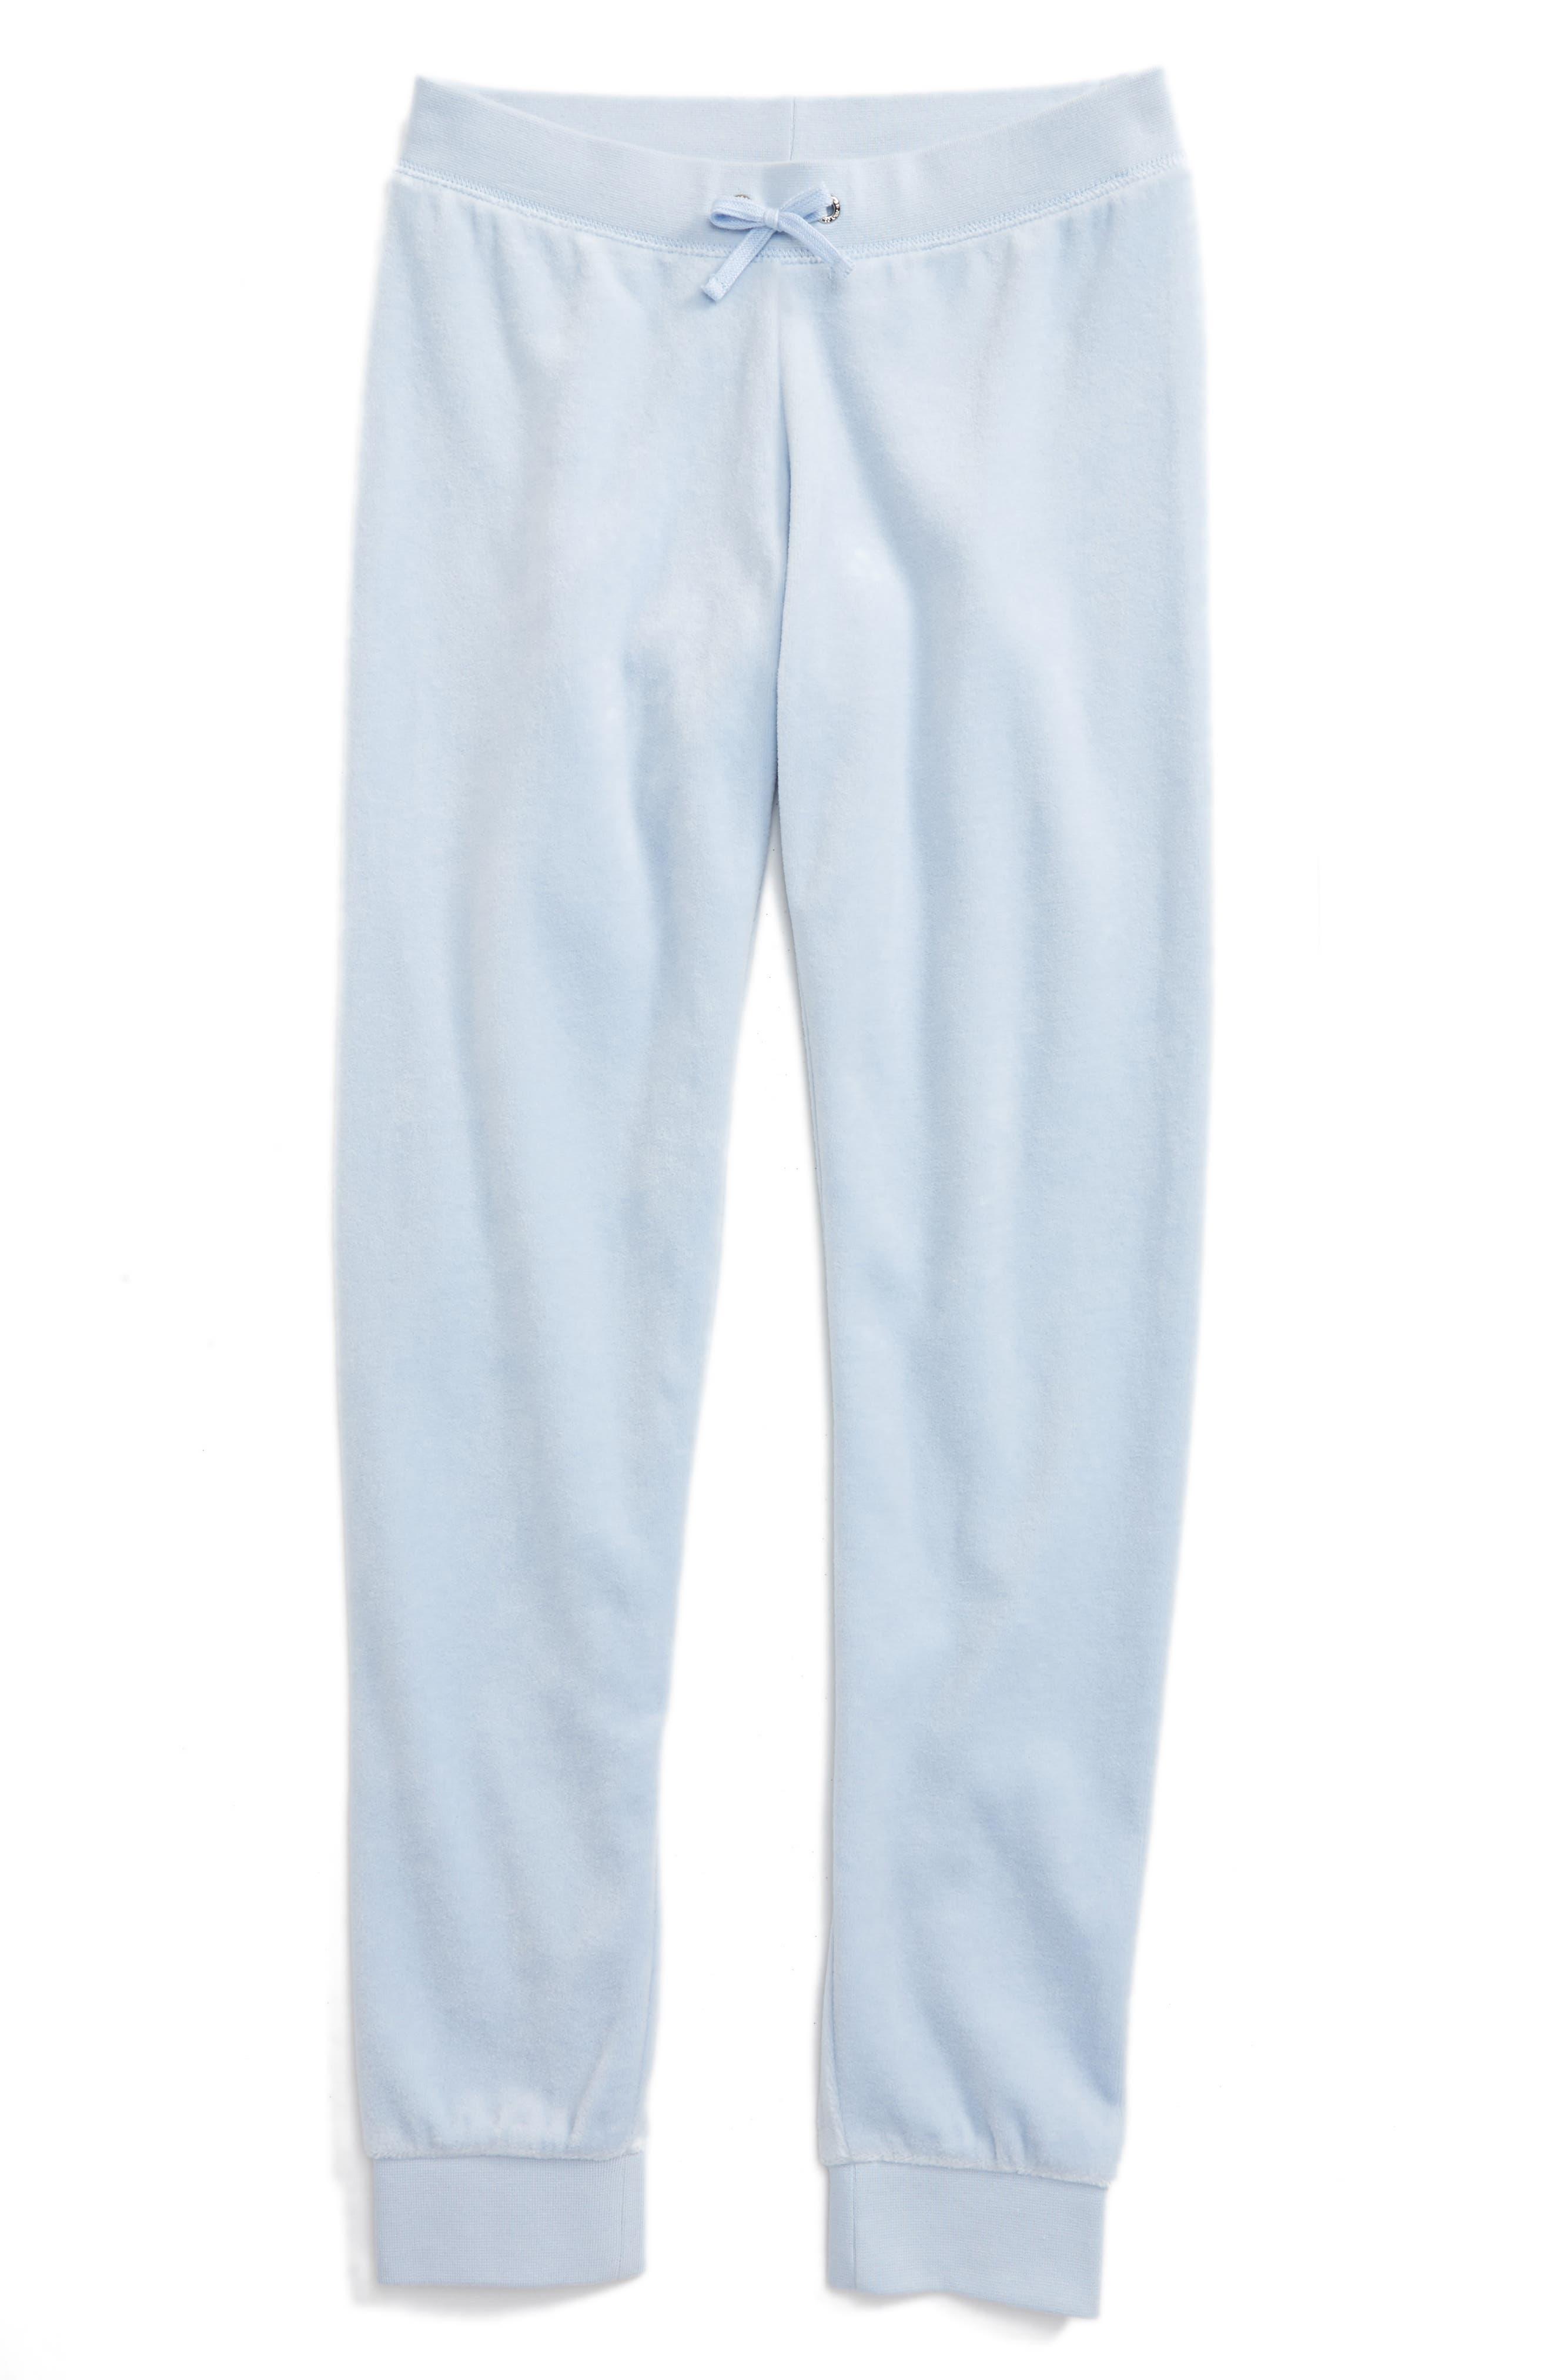 Juicy Couture Zuma Velour Pants (Big Girls)